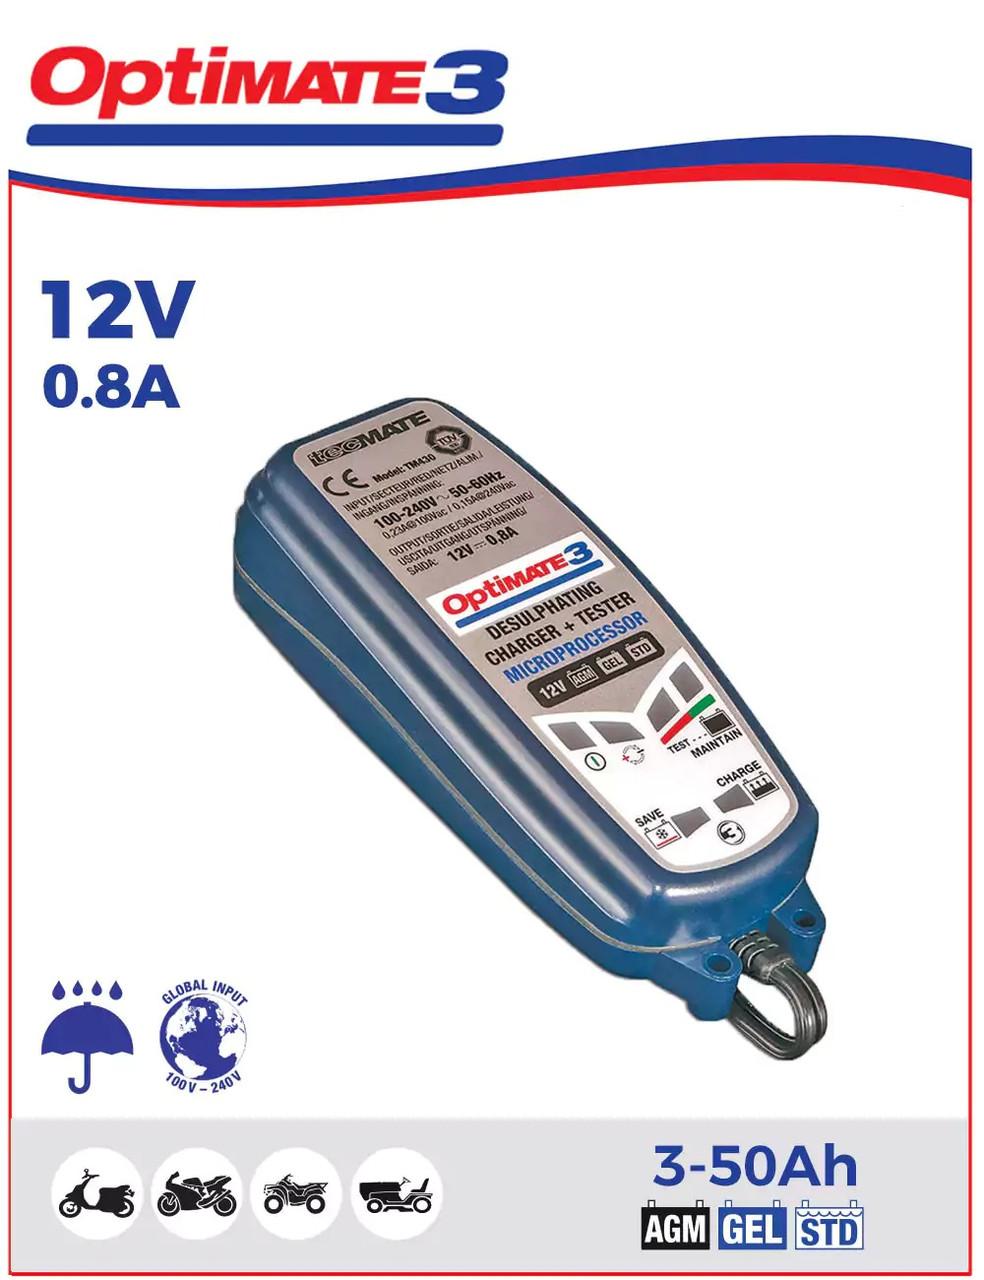 Зарядное устройство ™OptiMate 3 TM430 (1x0,8A, 12V)